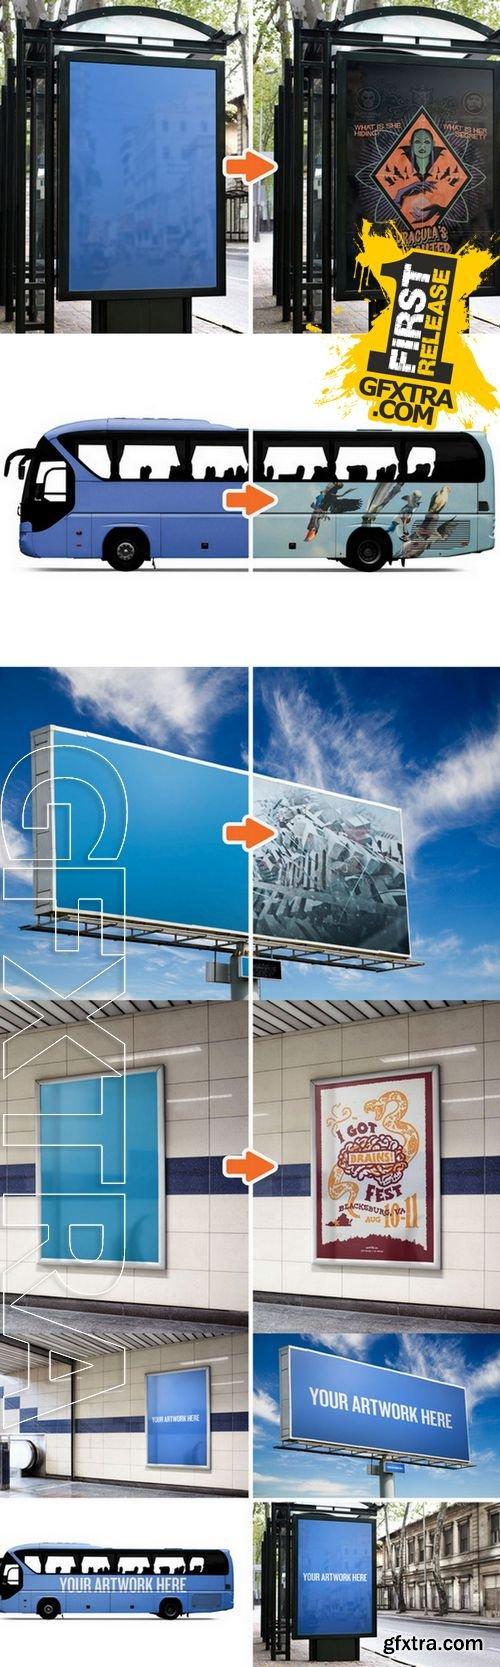 City Advertising Mockup Templates - CM 195640